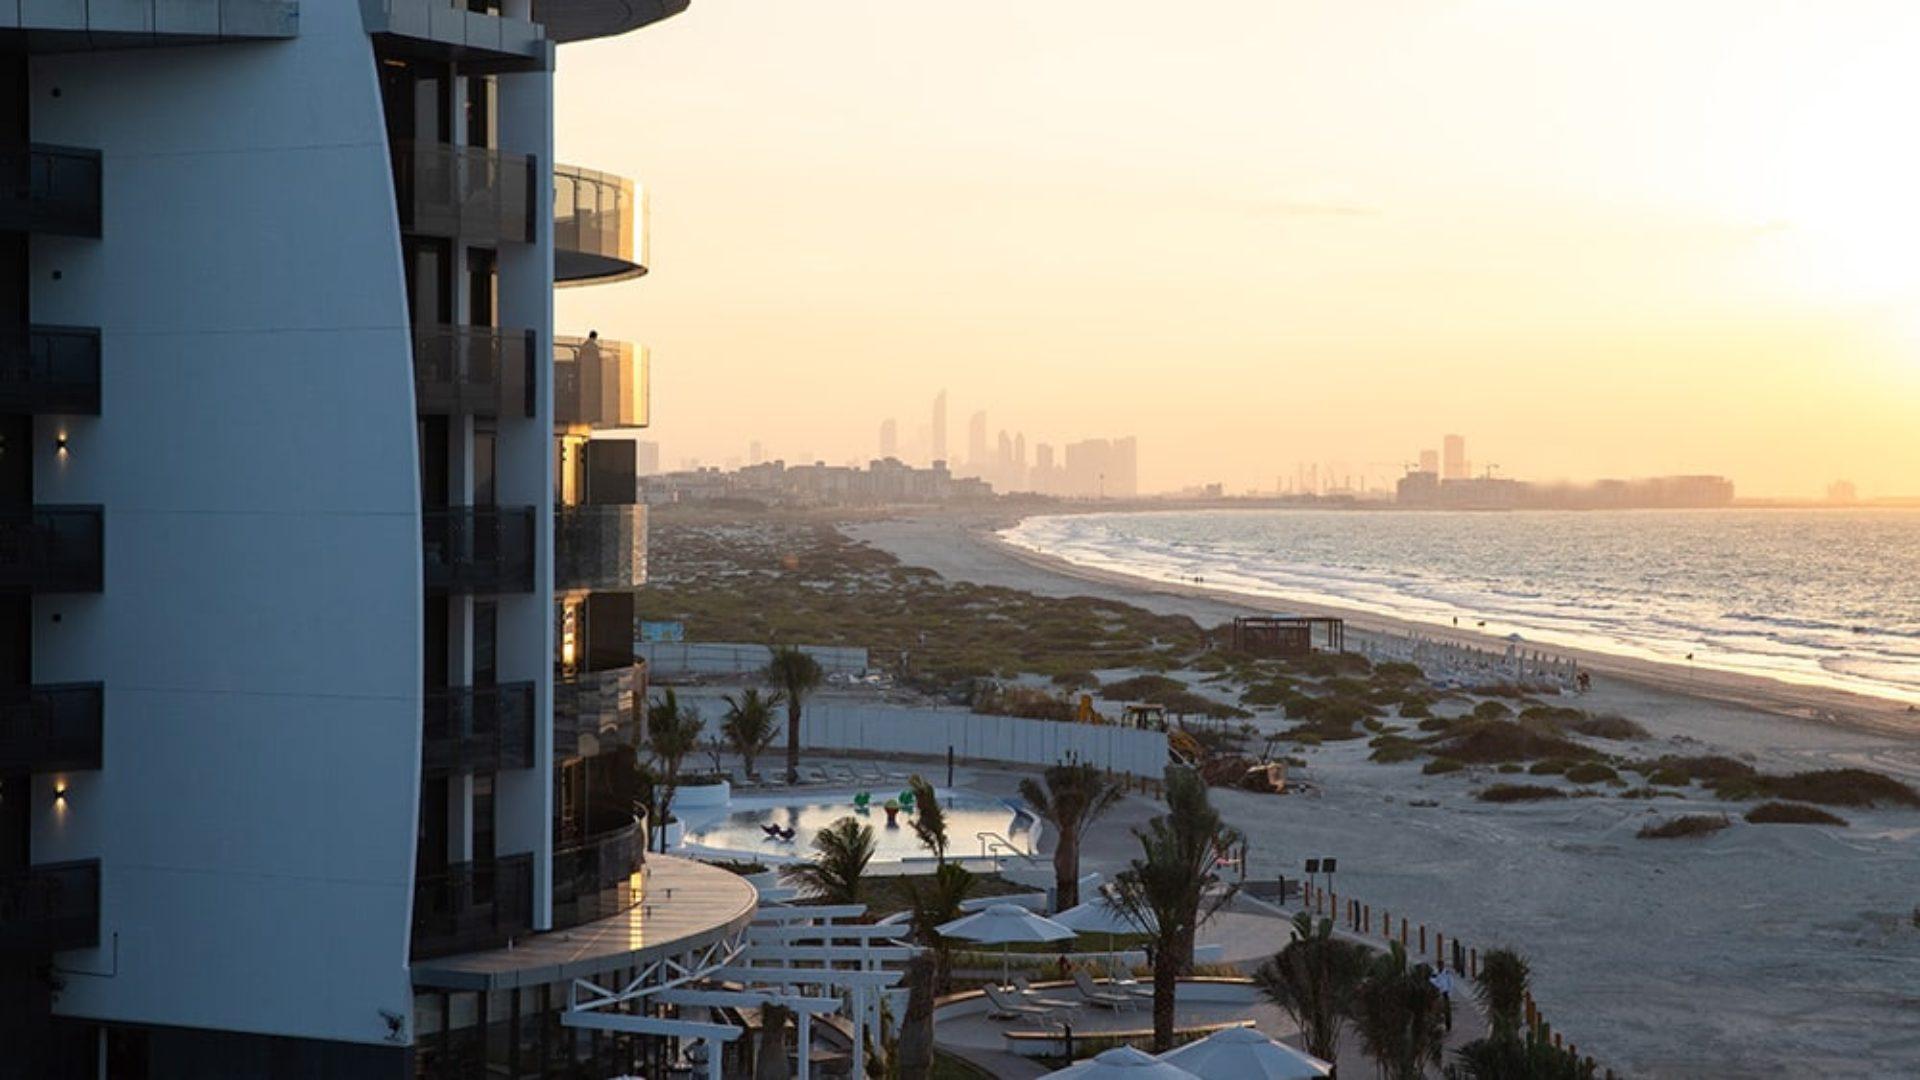 Sun setting over Abu Dhabi from Jumeirah at Saadiyat Island